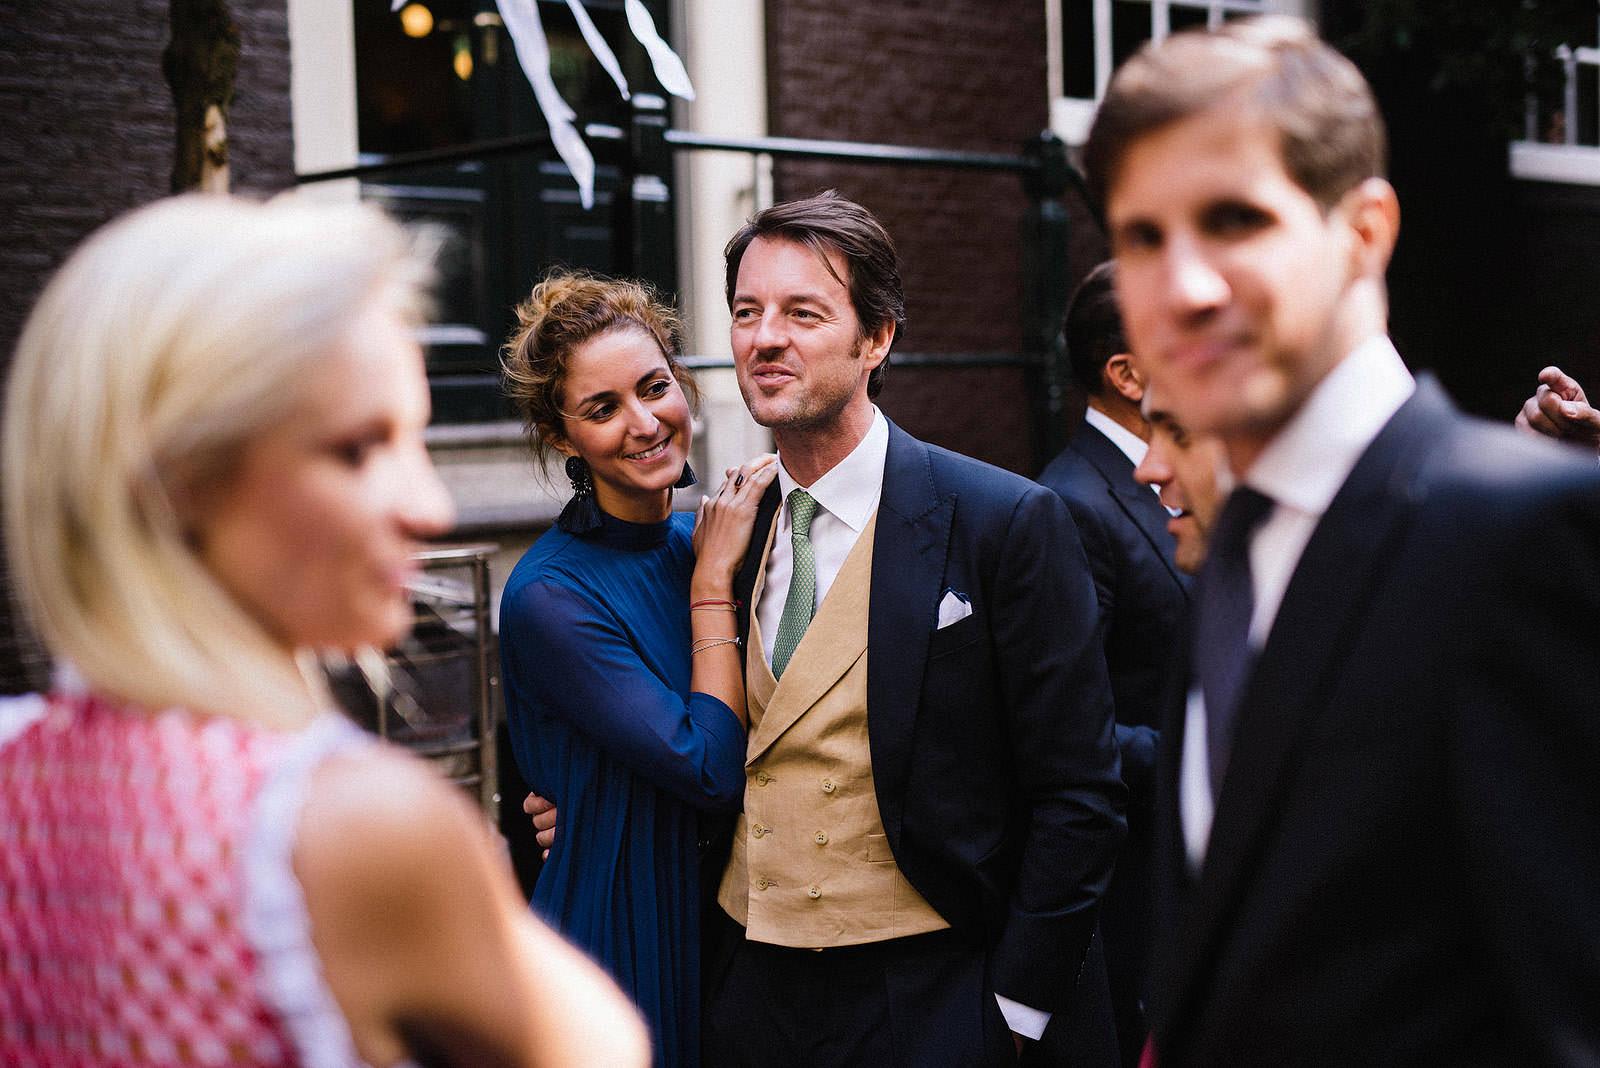 Fotograf Konstanz - Destination Wedding Photographer Amsterdam 078 - Destination Wedding Amsterdam  - 186 -